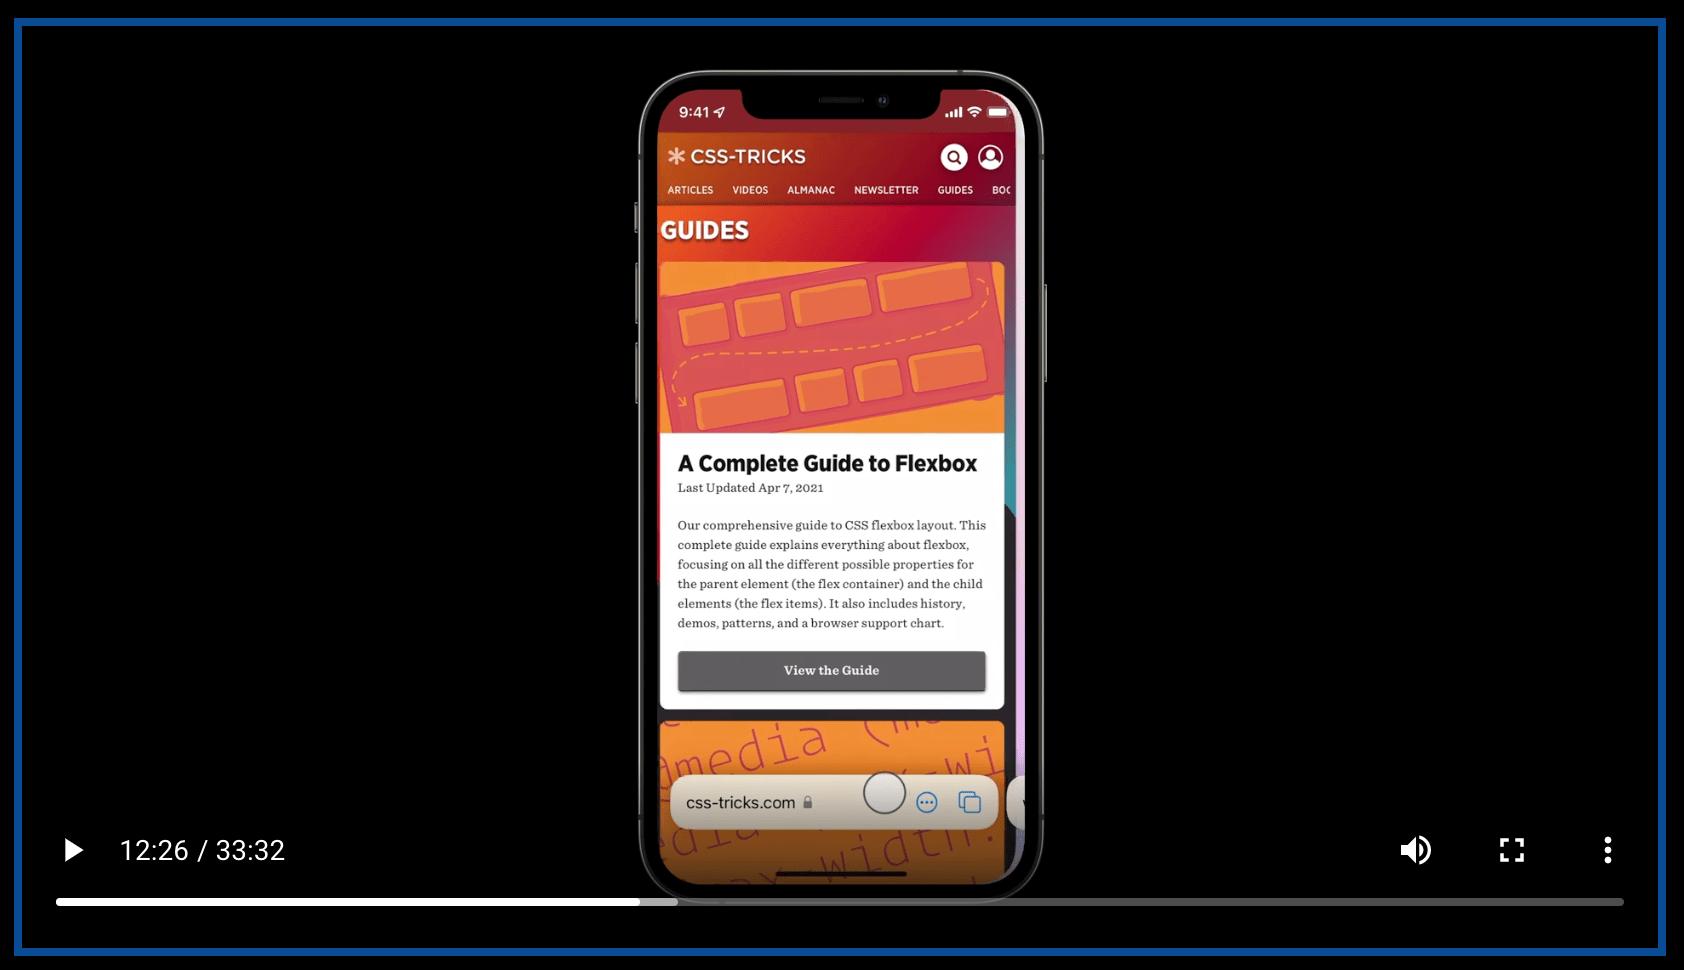 Safari 15: New UI, Theme Colors, and… a CSS-Tricks Cameo! 5